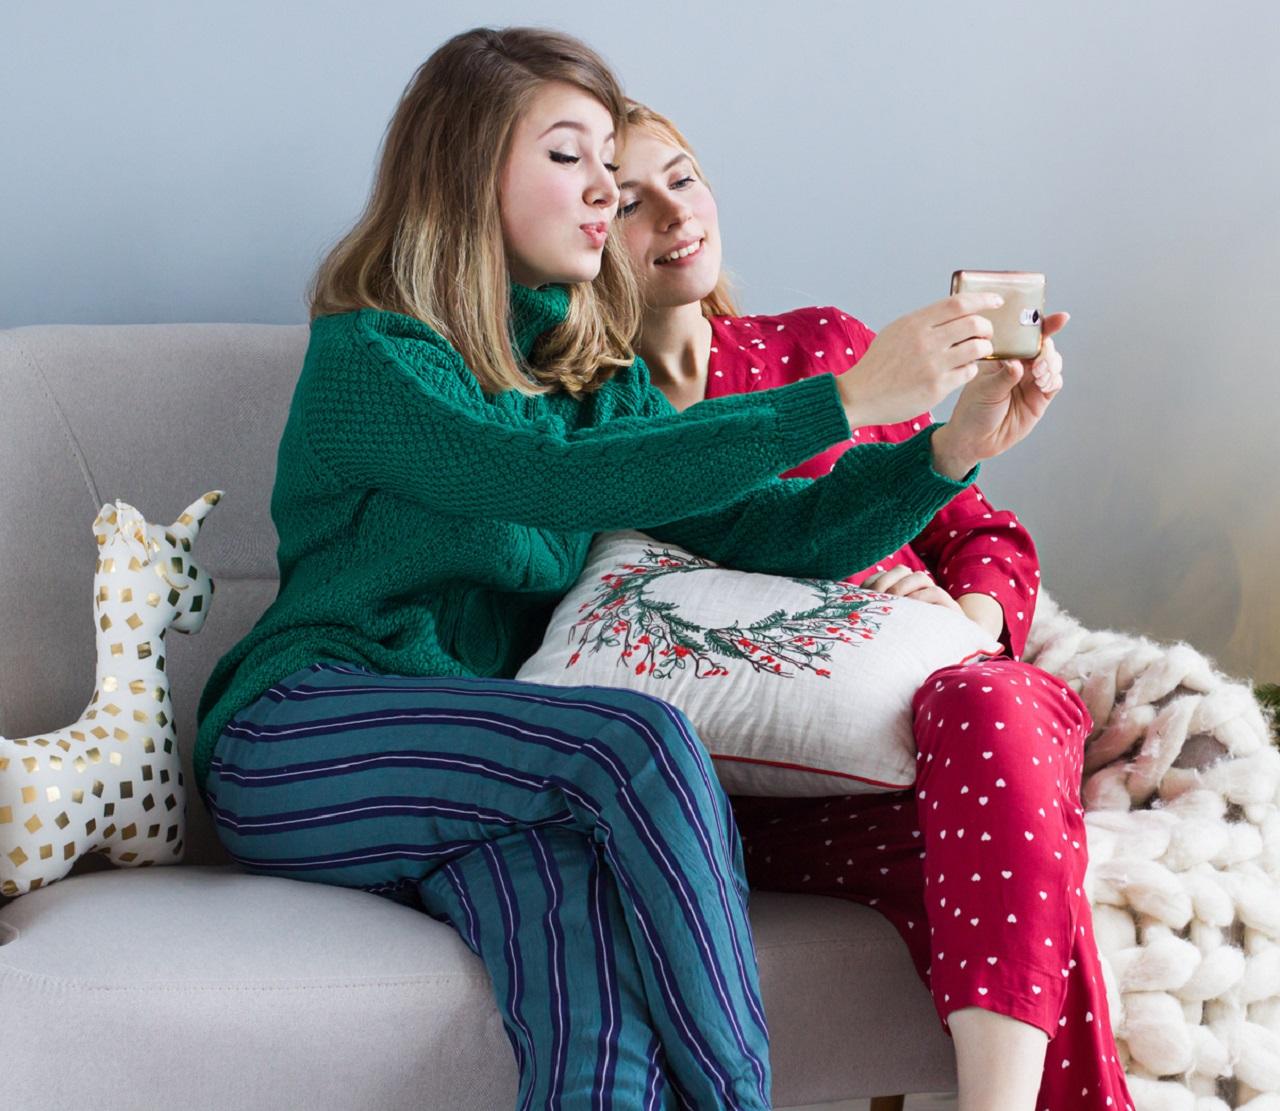 Choisir un pyjama